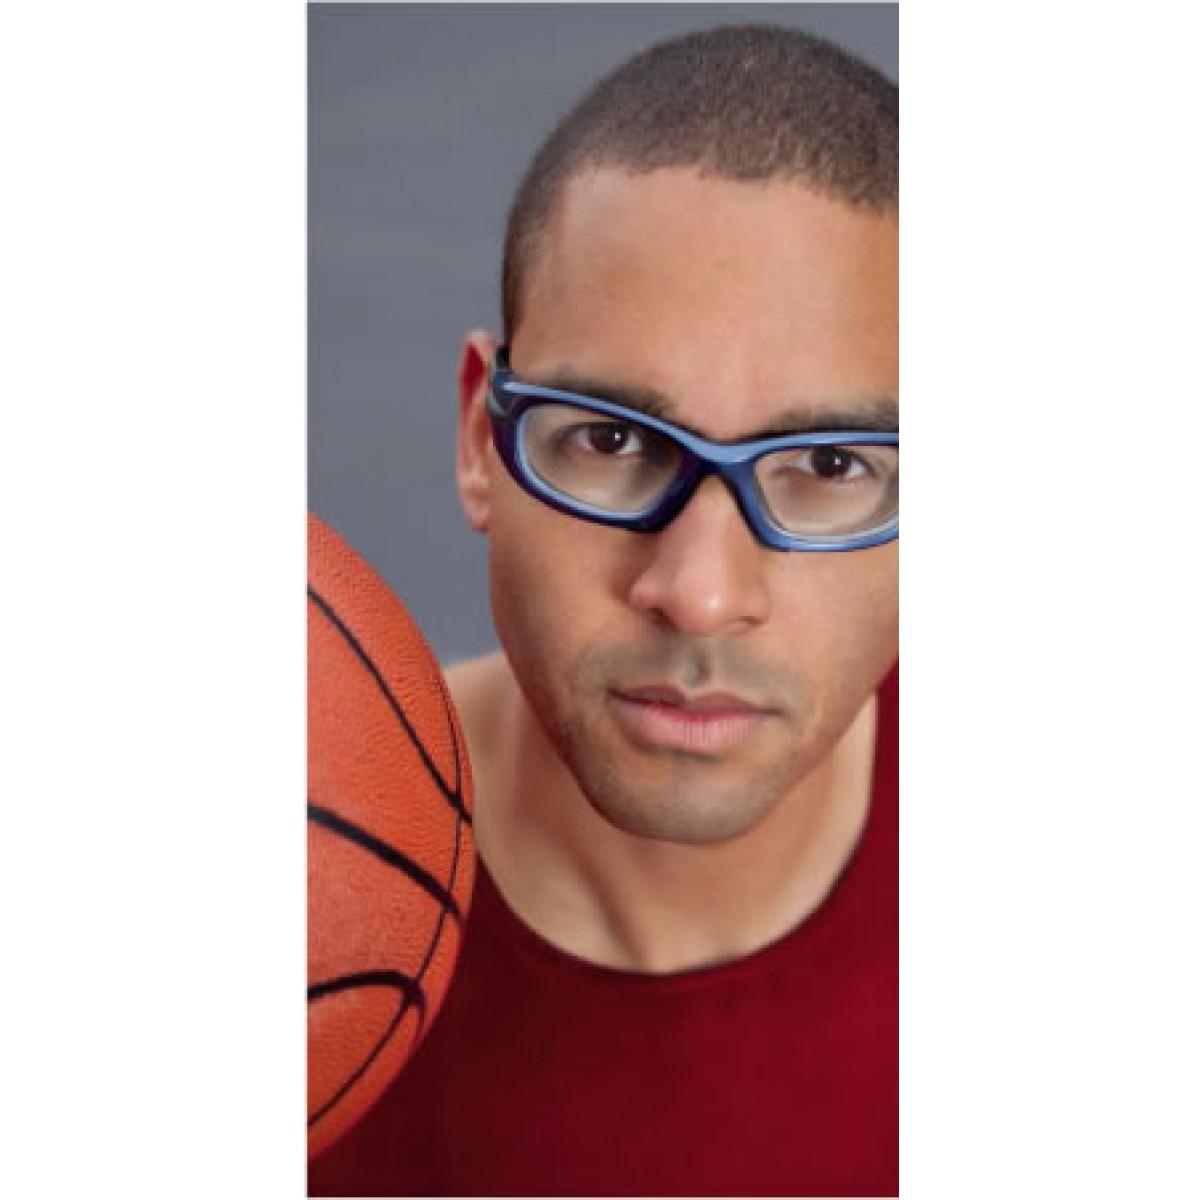 ff21427be Óculos Progear Adulto Azul TM55 c/ Grau e Lentes Anti-Embaçantes